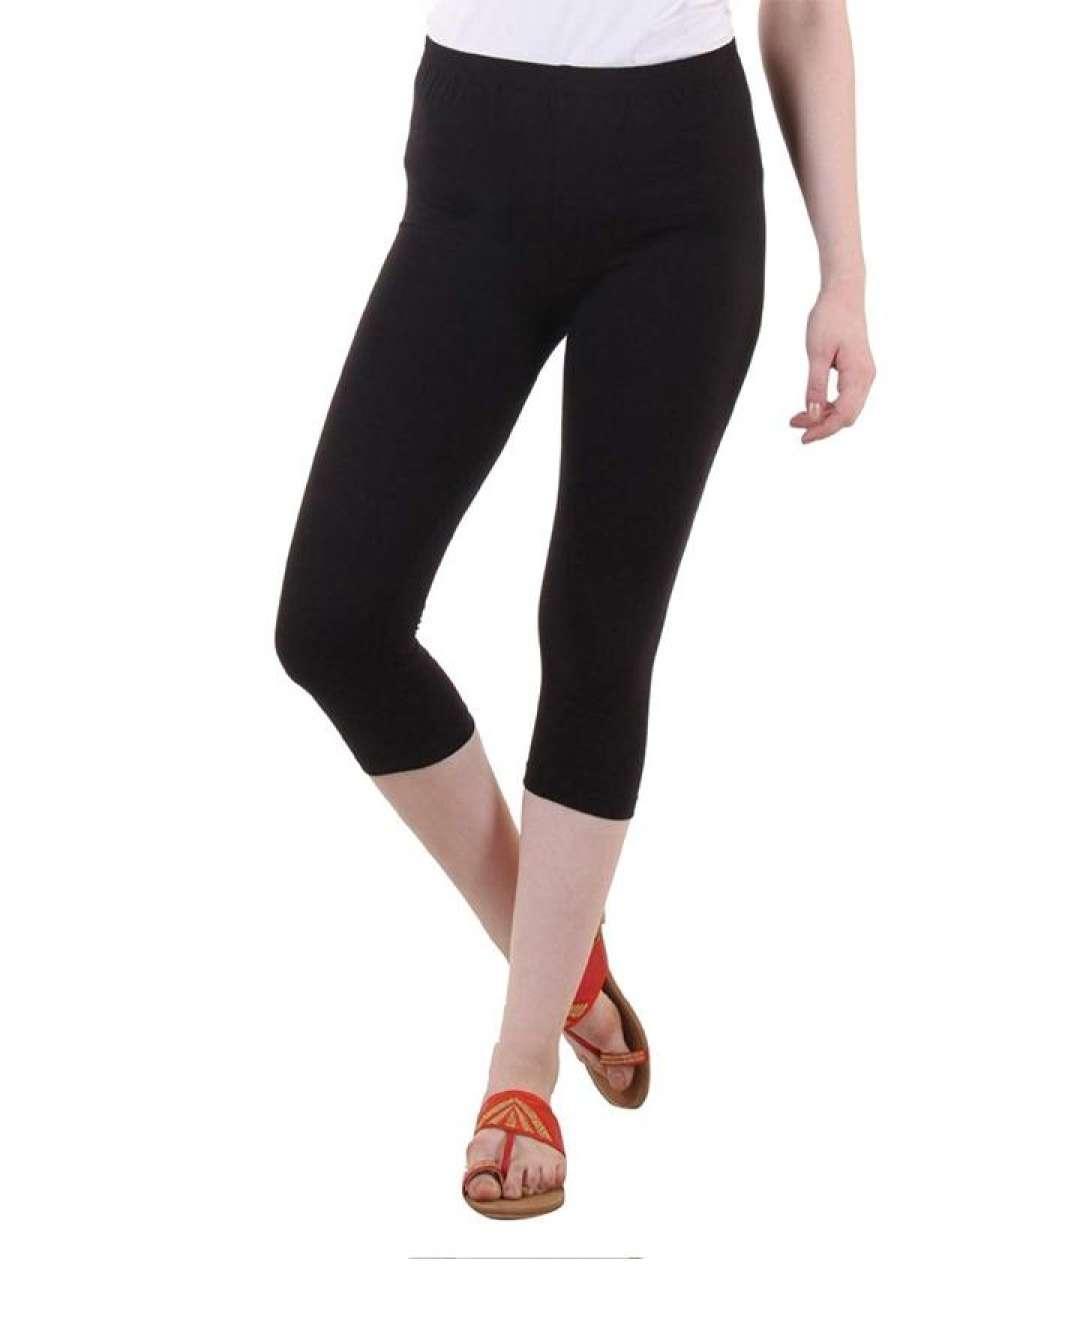 440223e60 Buy Mardaz Leggings at Best Prices Online in Pakistan - daraz.pk